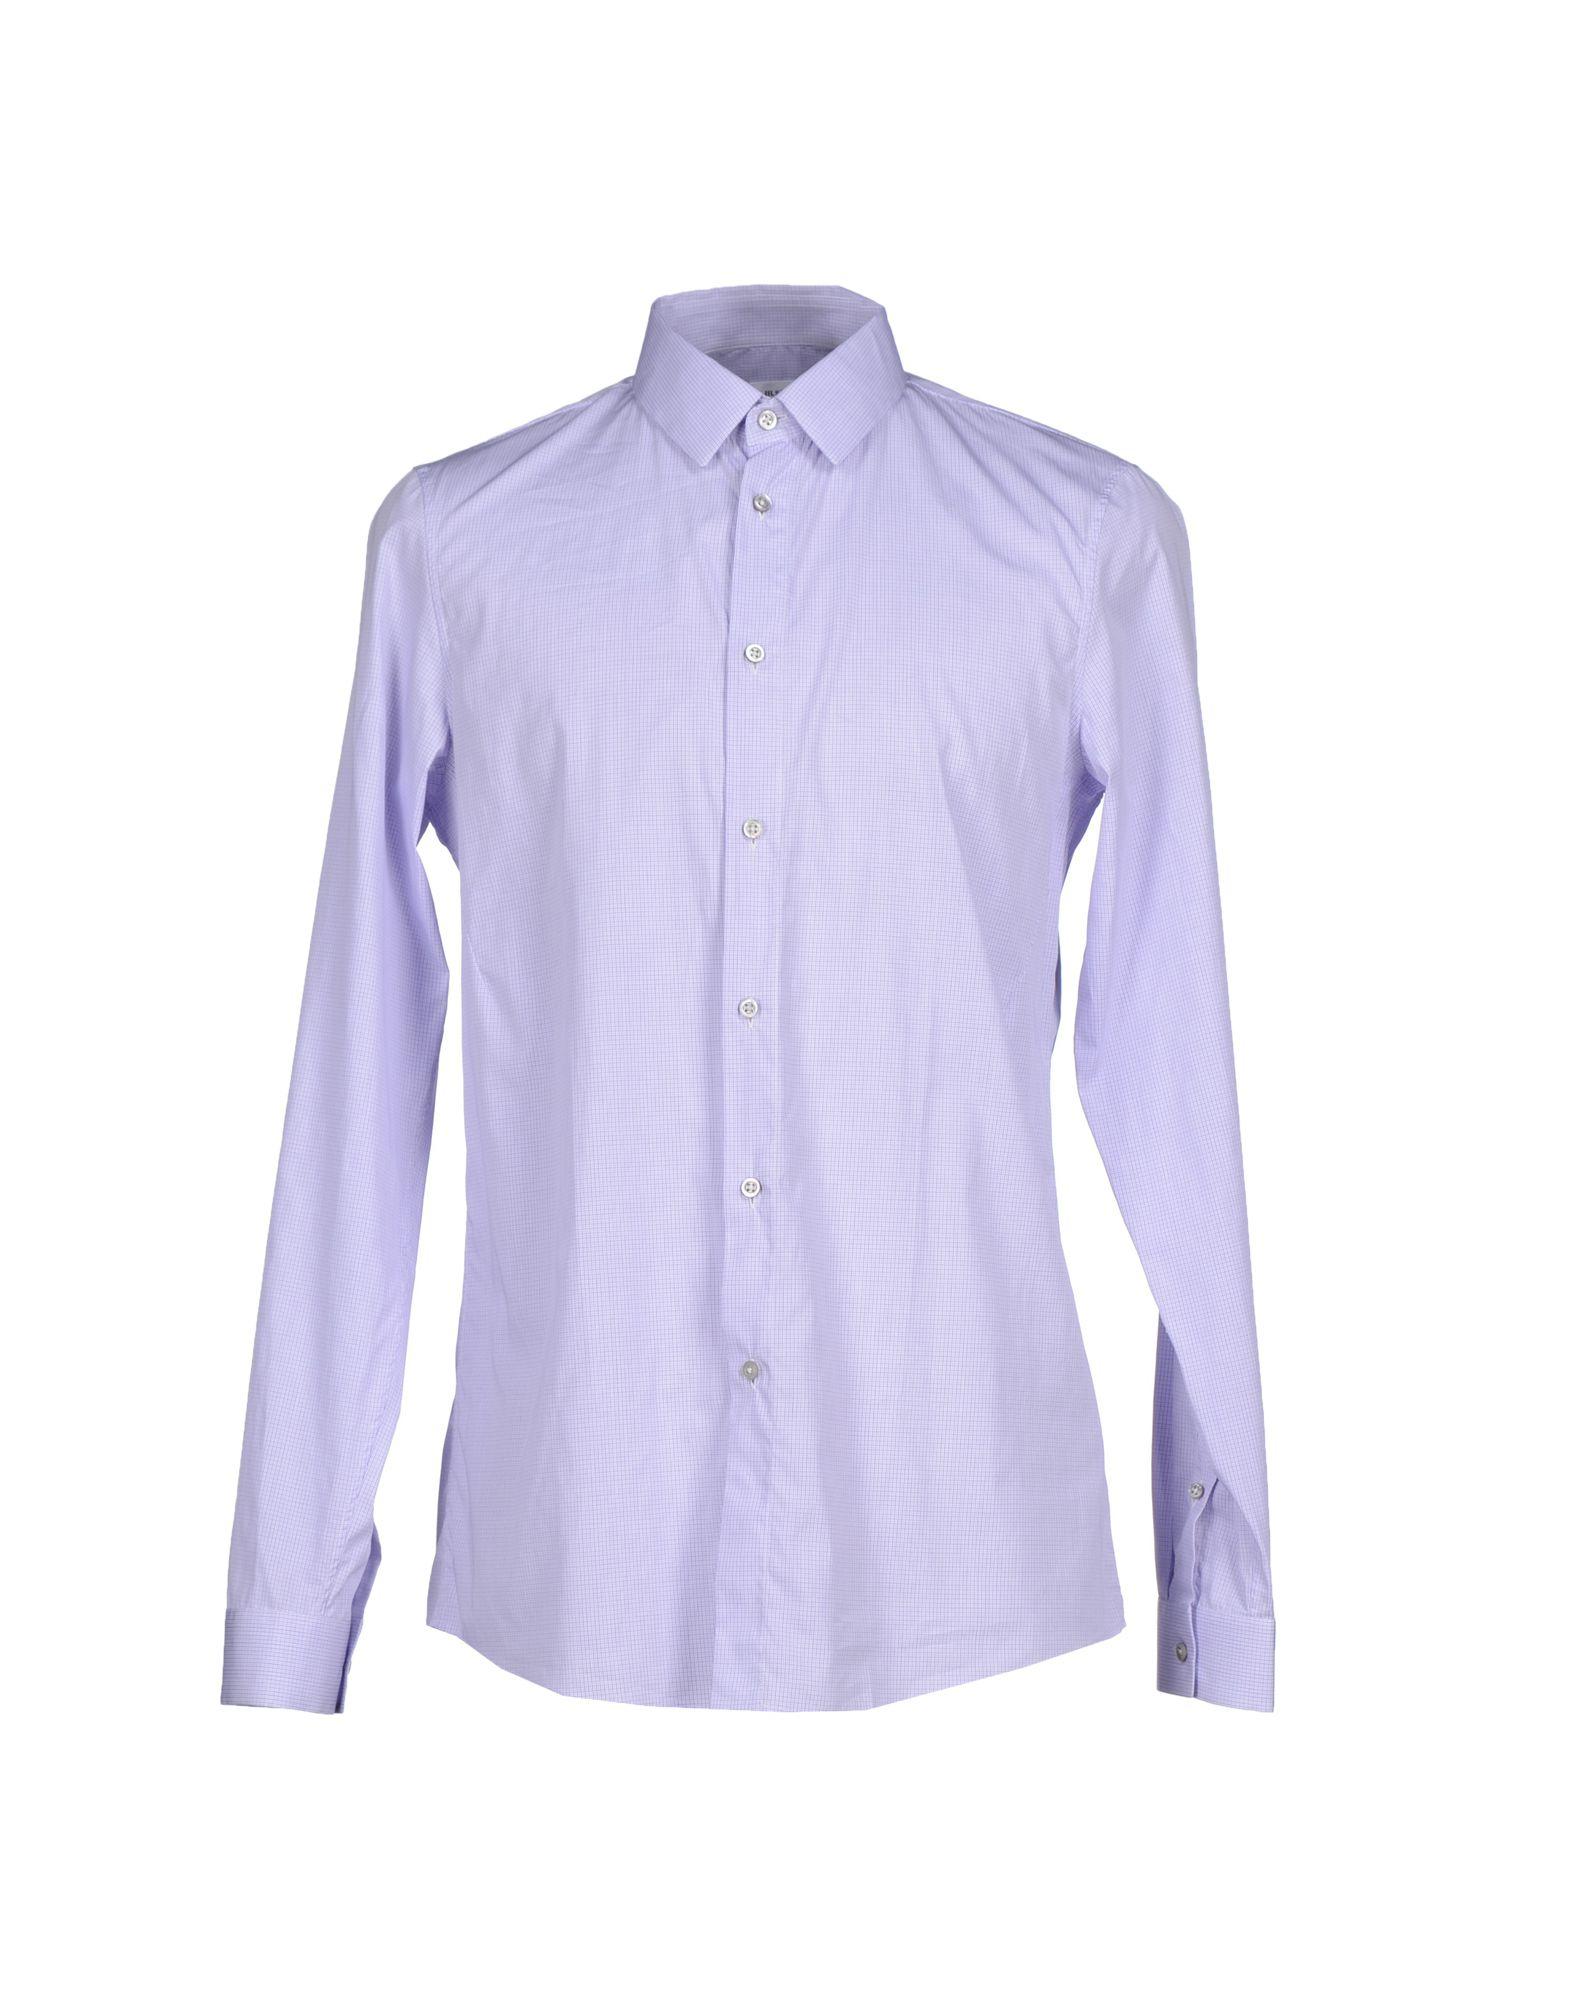 Jil sander shirt in purple for men lyst for Jil sander mens shirt